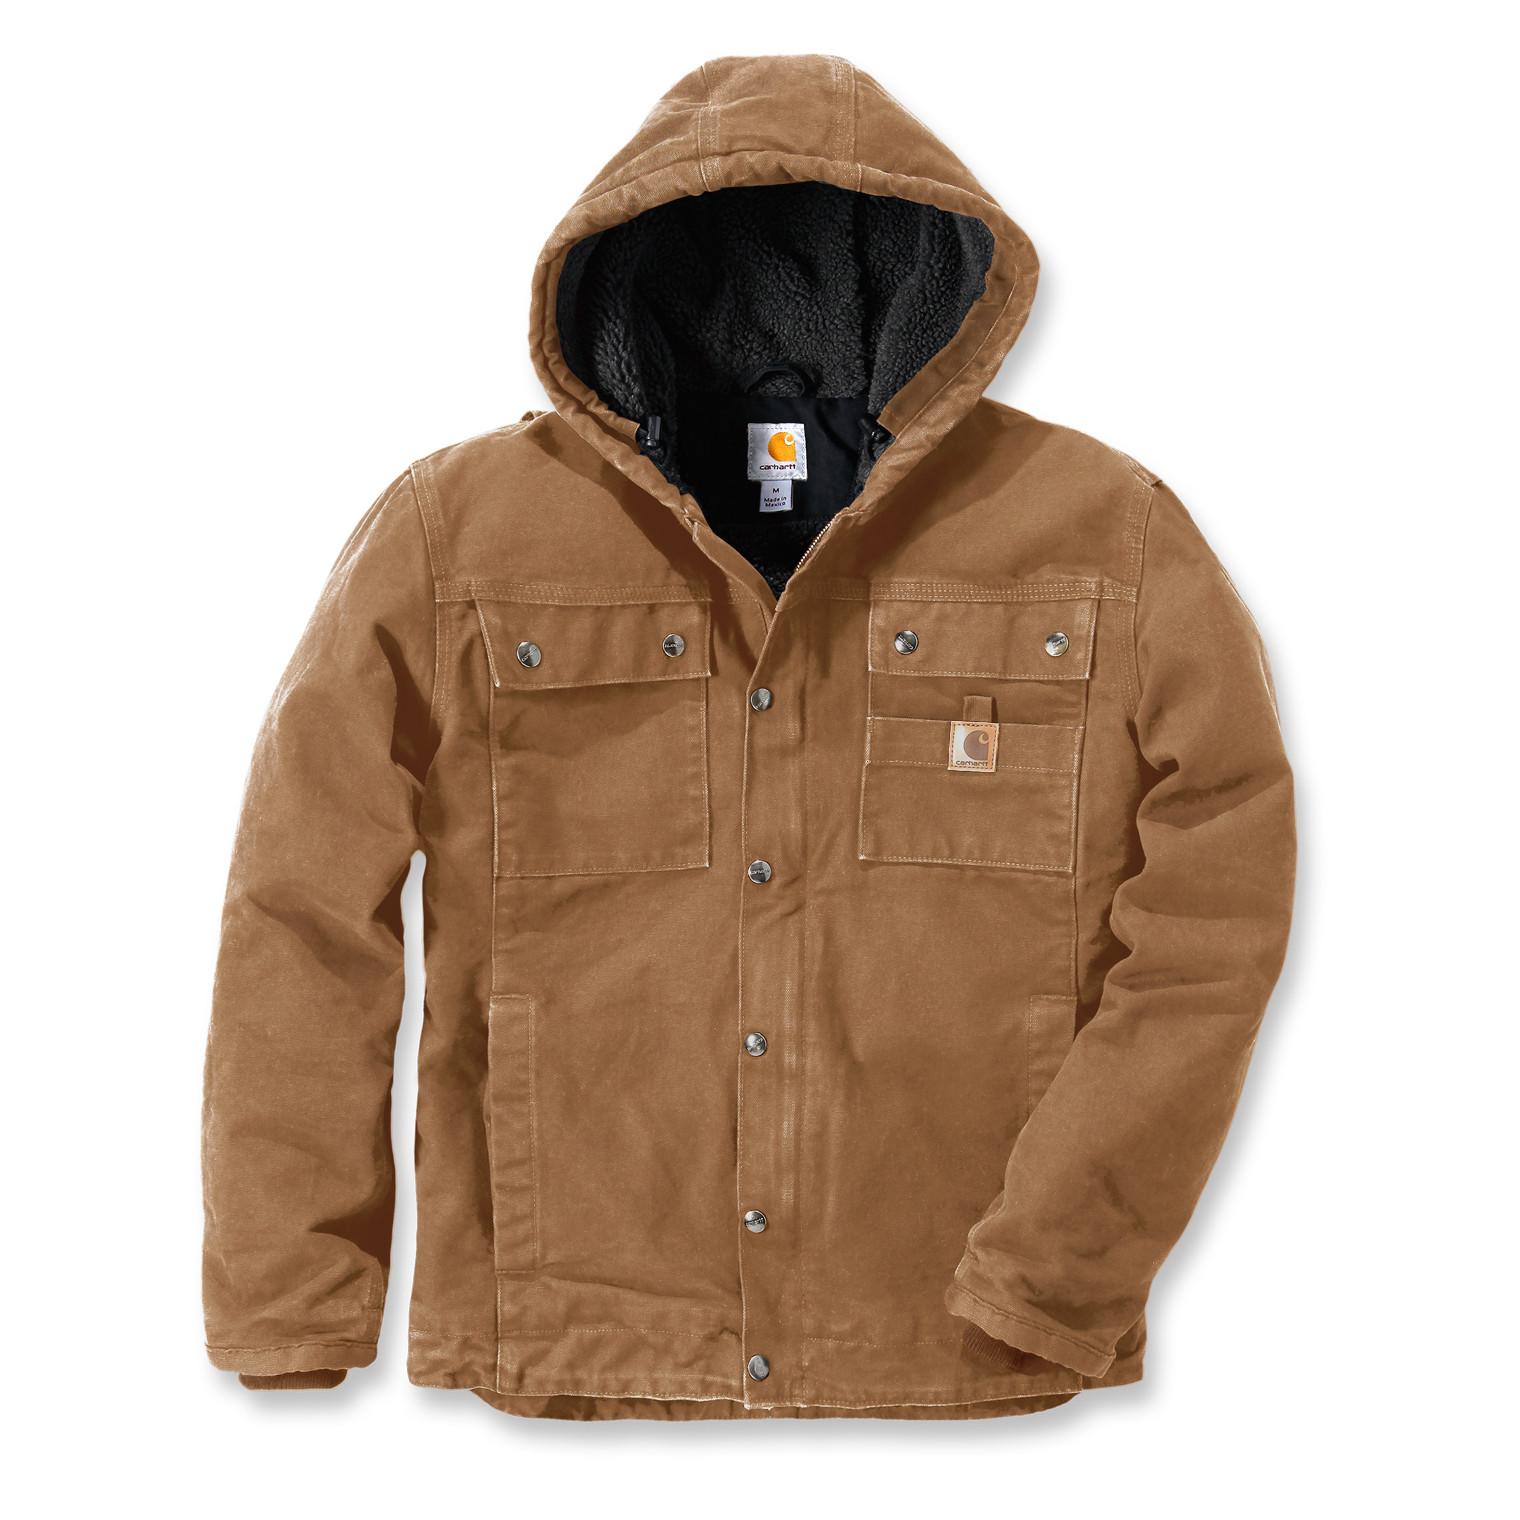 Куртка котоновая Carhartt Sandstone Barlett Jacket - 102285 (Carhartt Brown, XL)